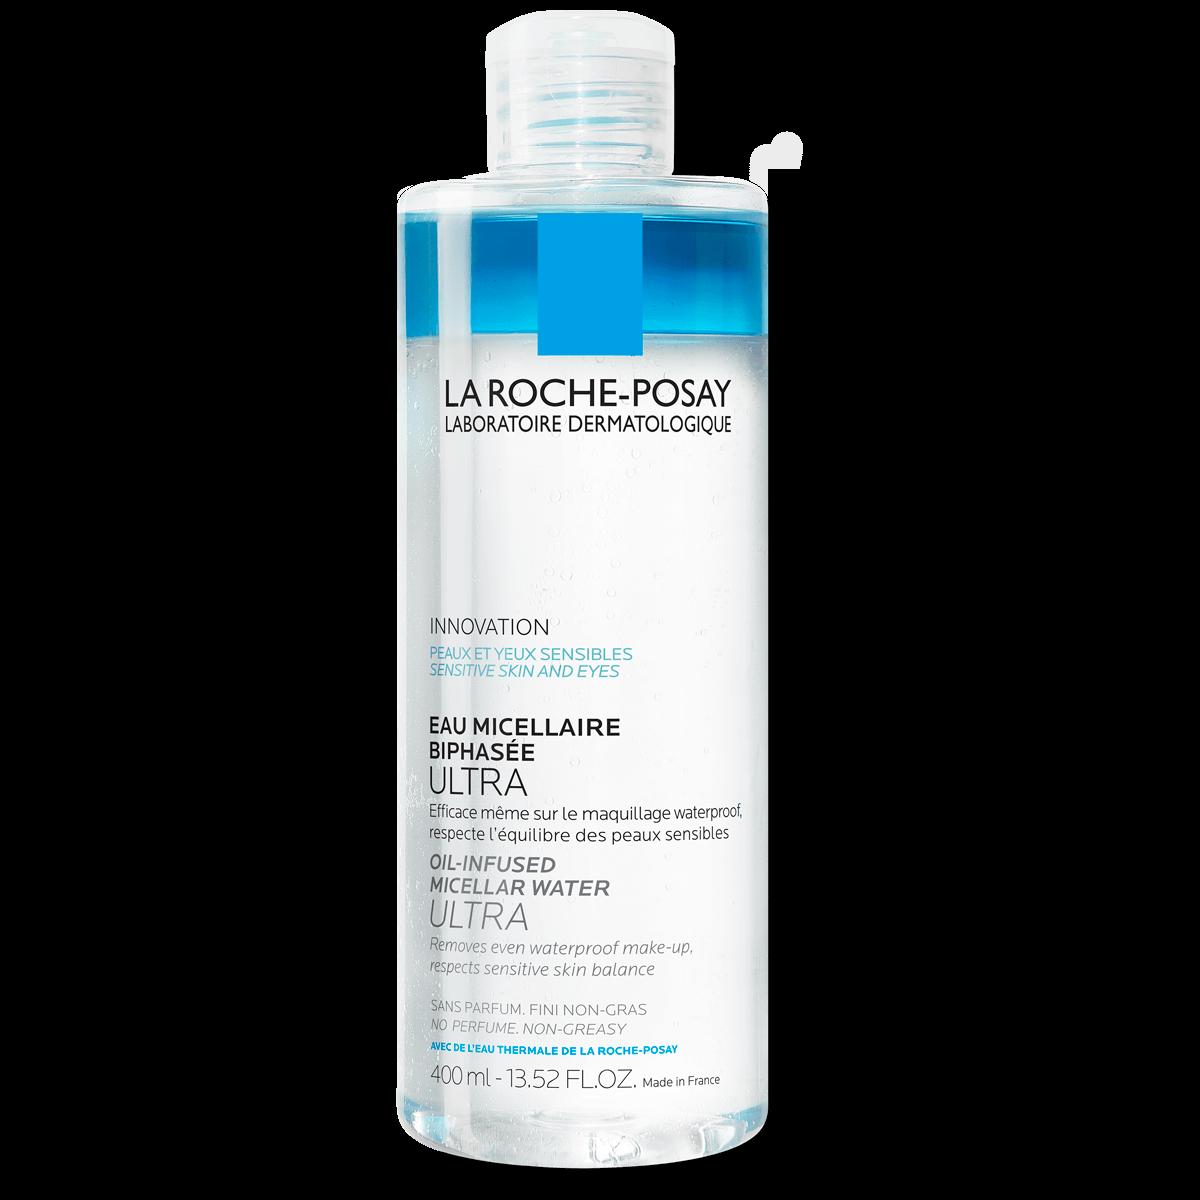 Água Micelar Ultra Bifásica, remove até maquilhagem à prova de água | La Roche-Posay